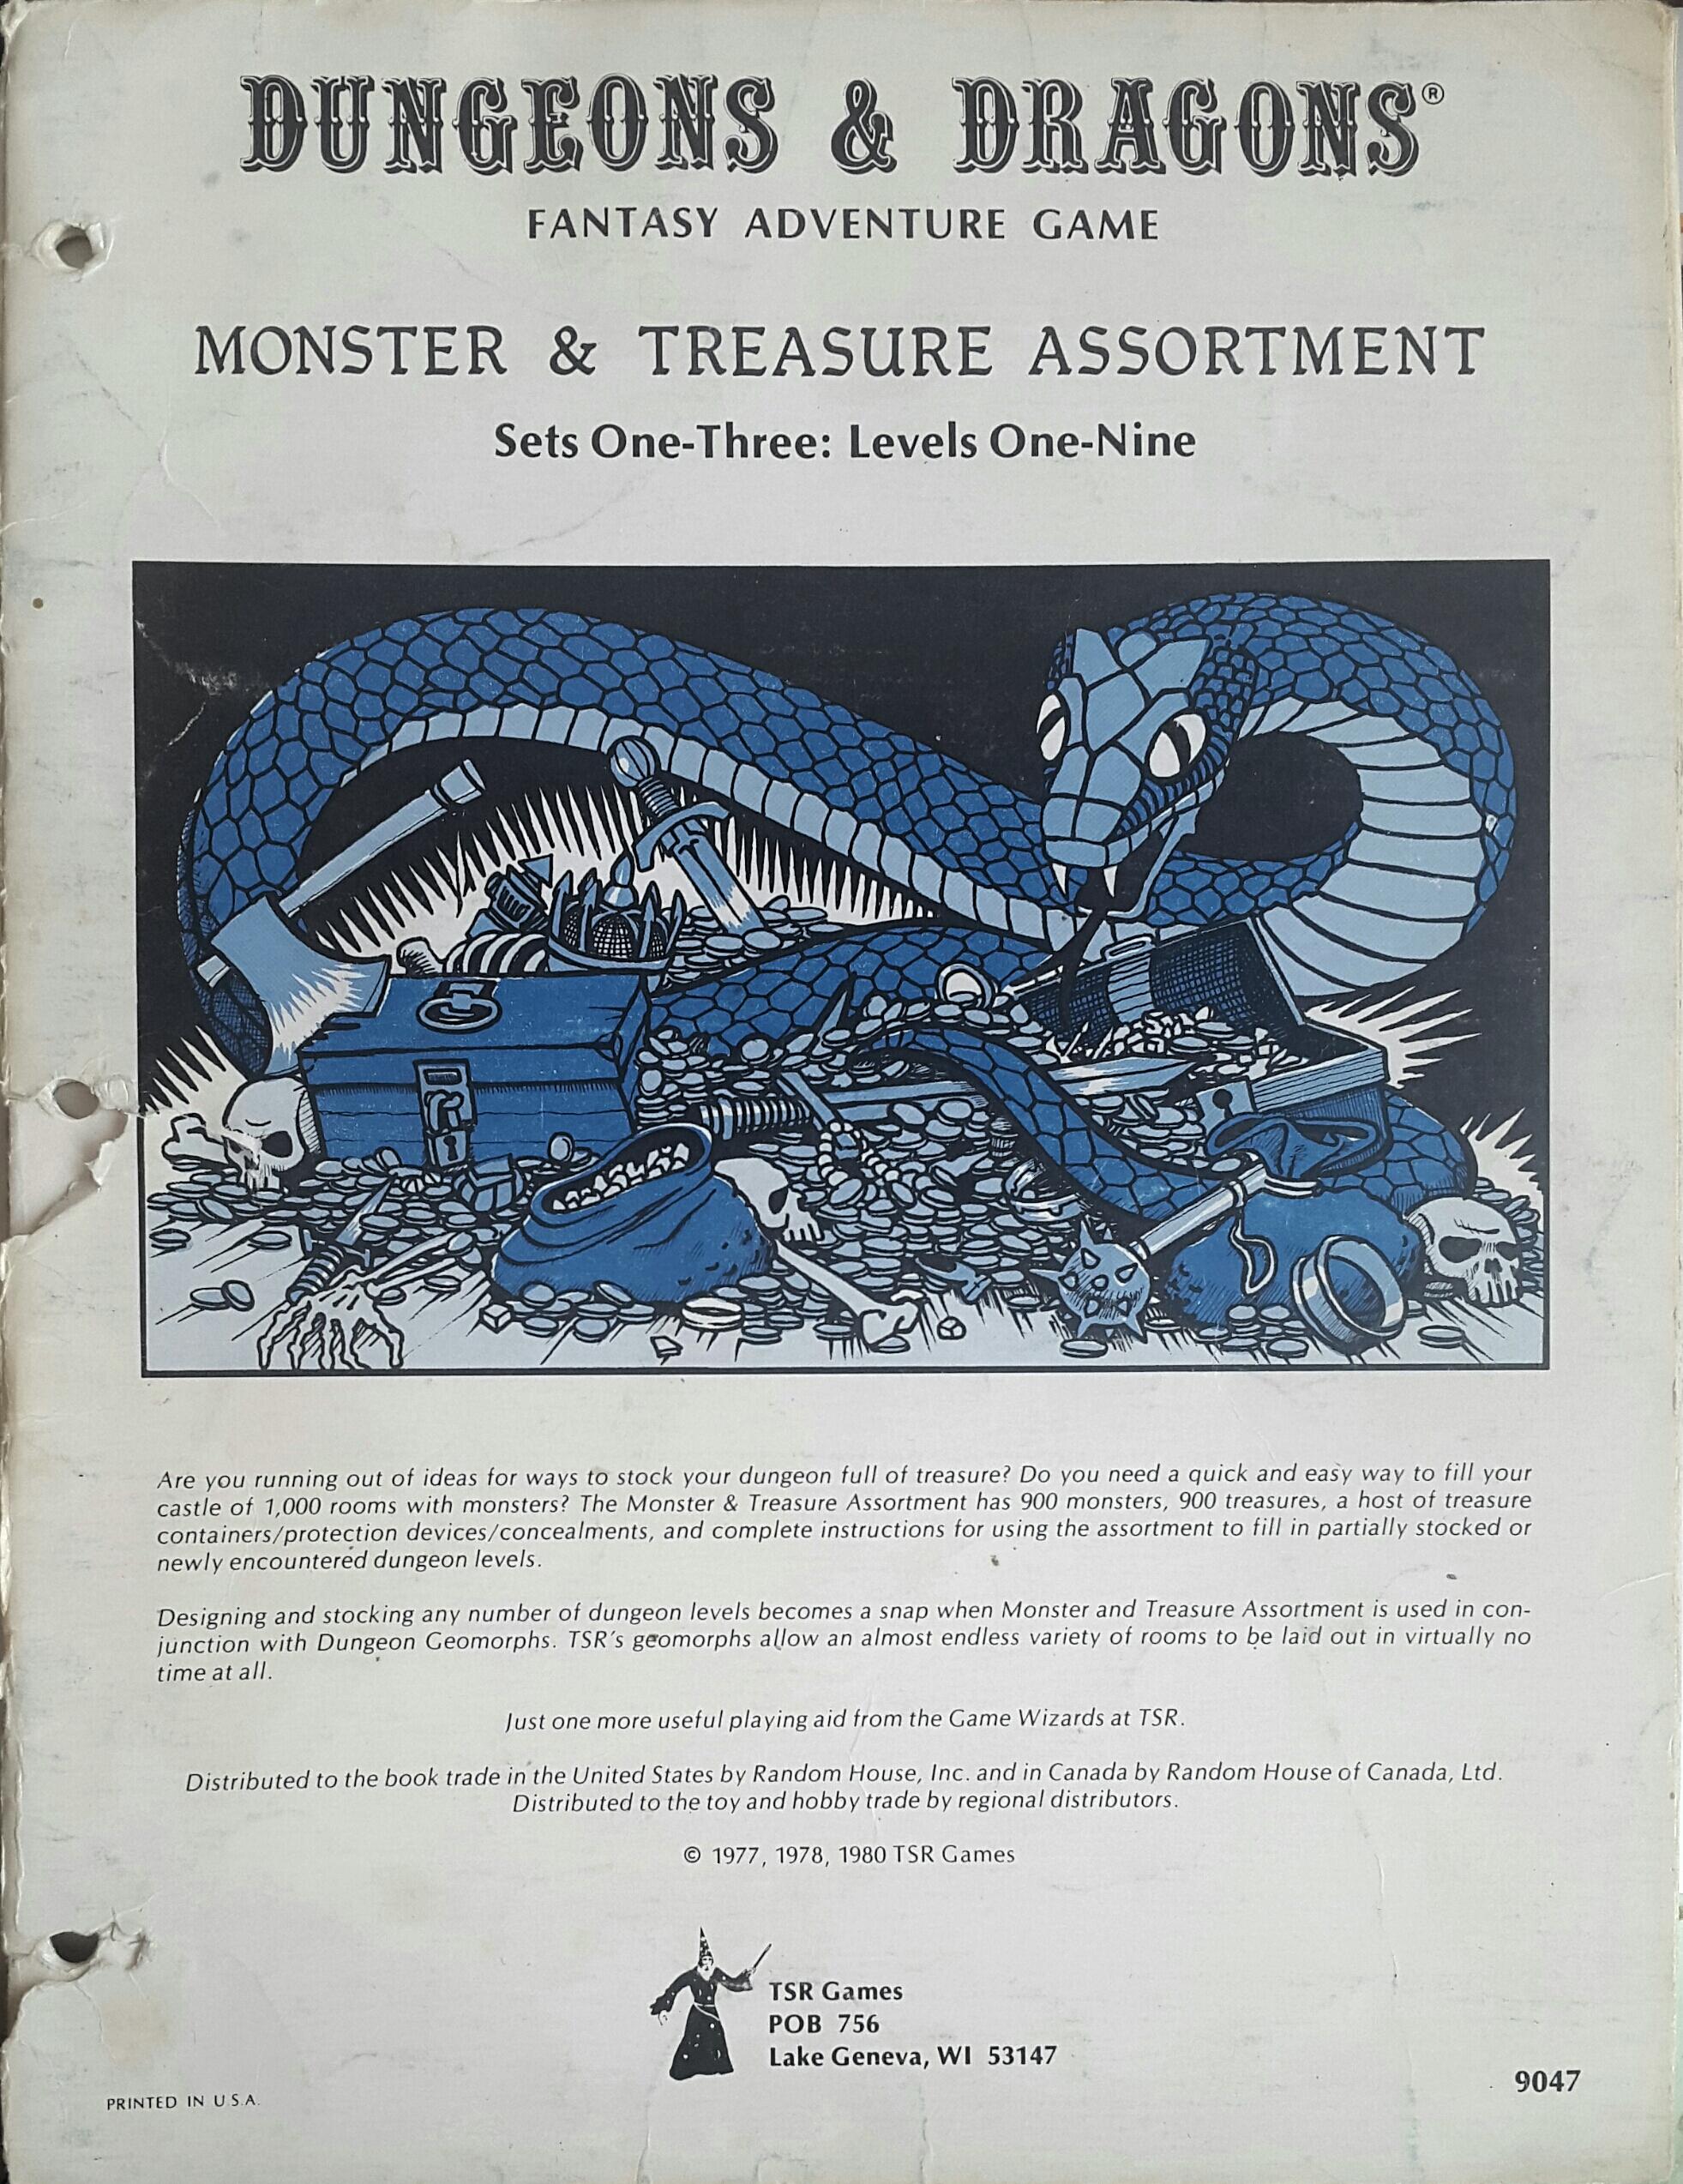 Monster & Treasure Assortment